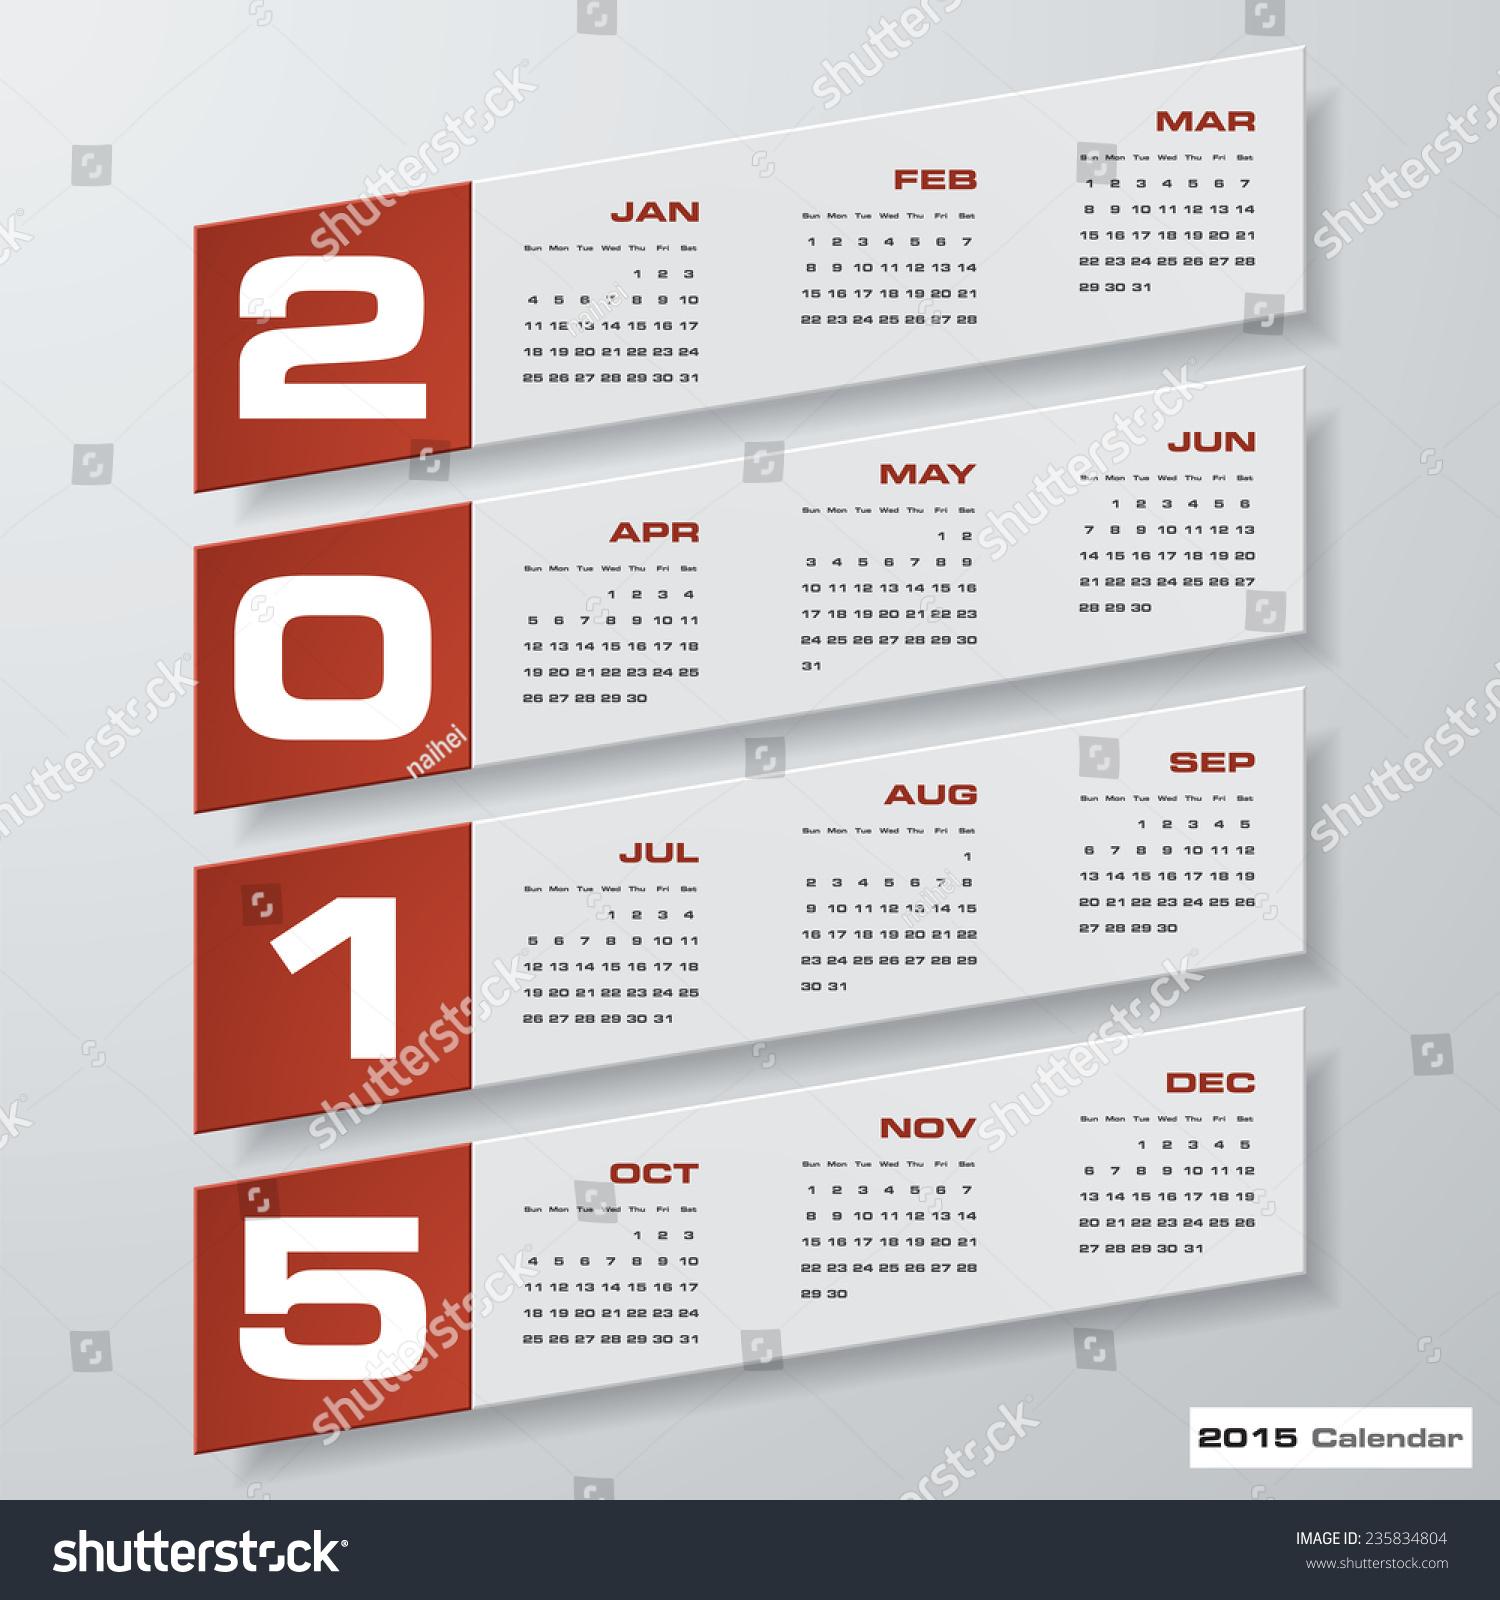 Simple Editable Vector Calendar 2015 Stock Vector 235834804 ...